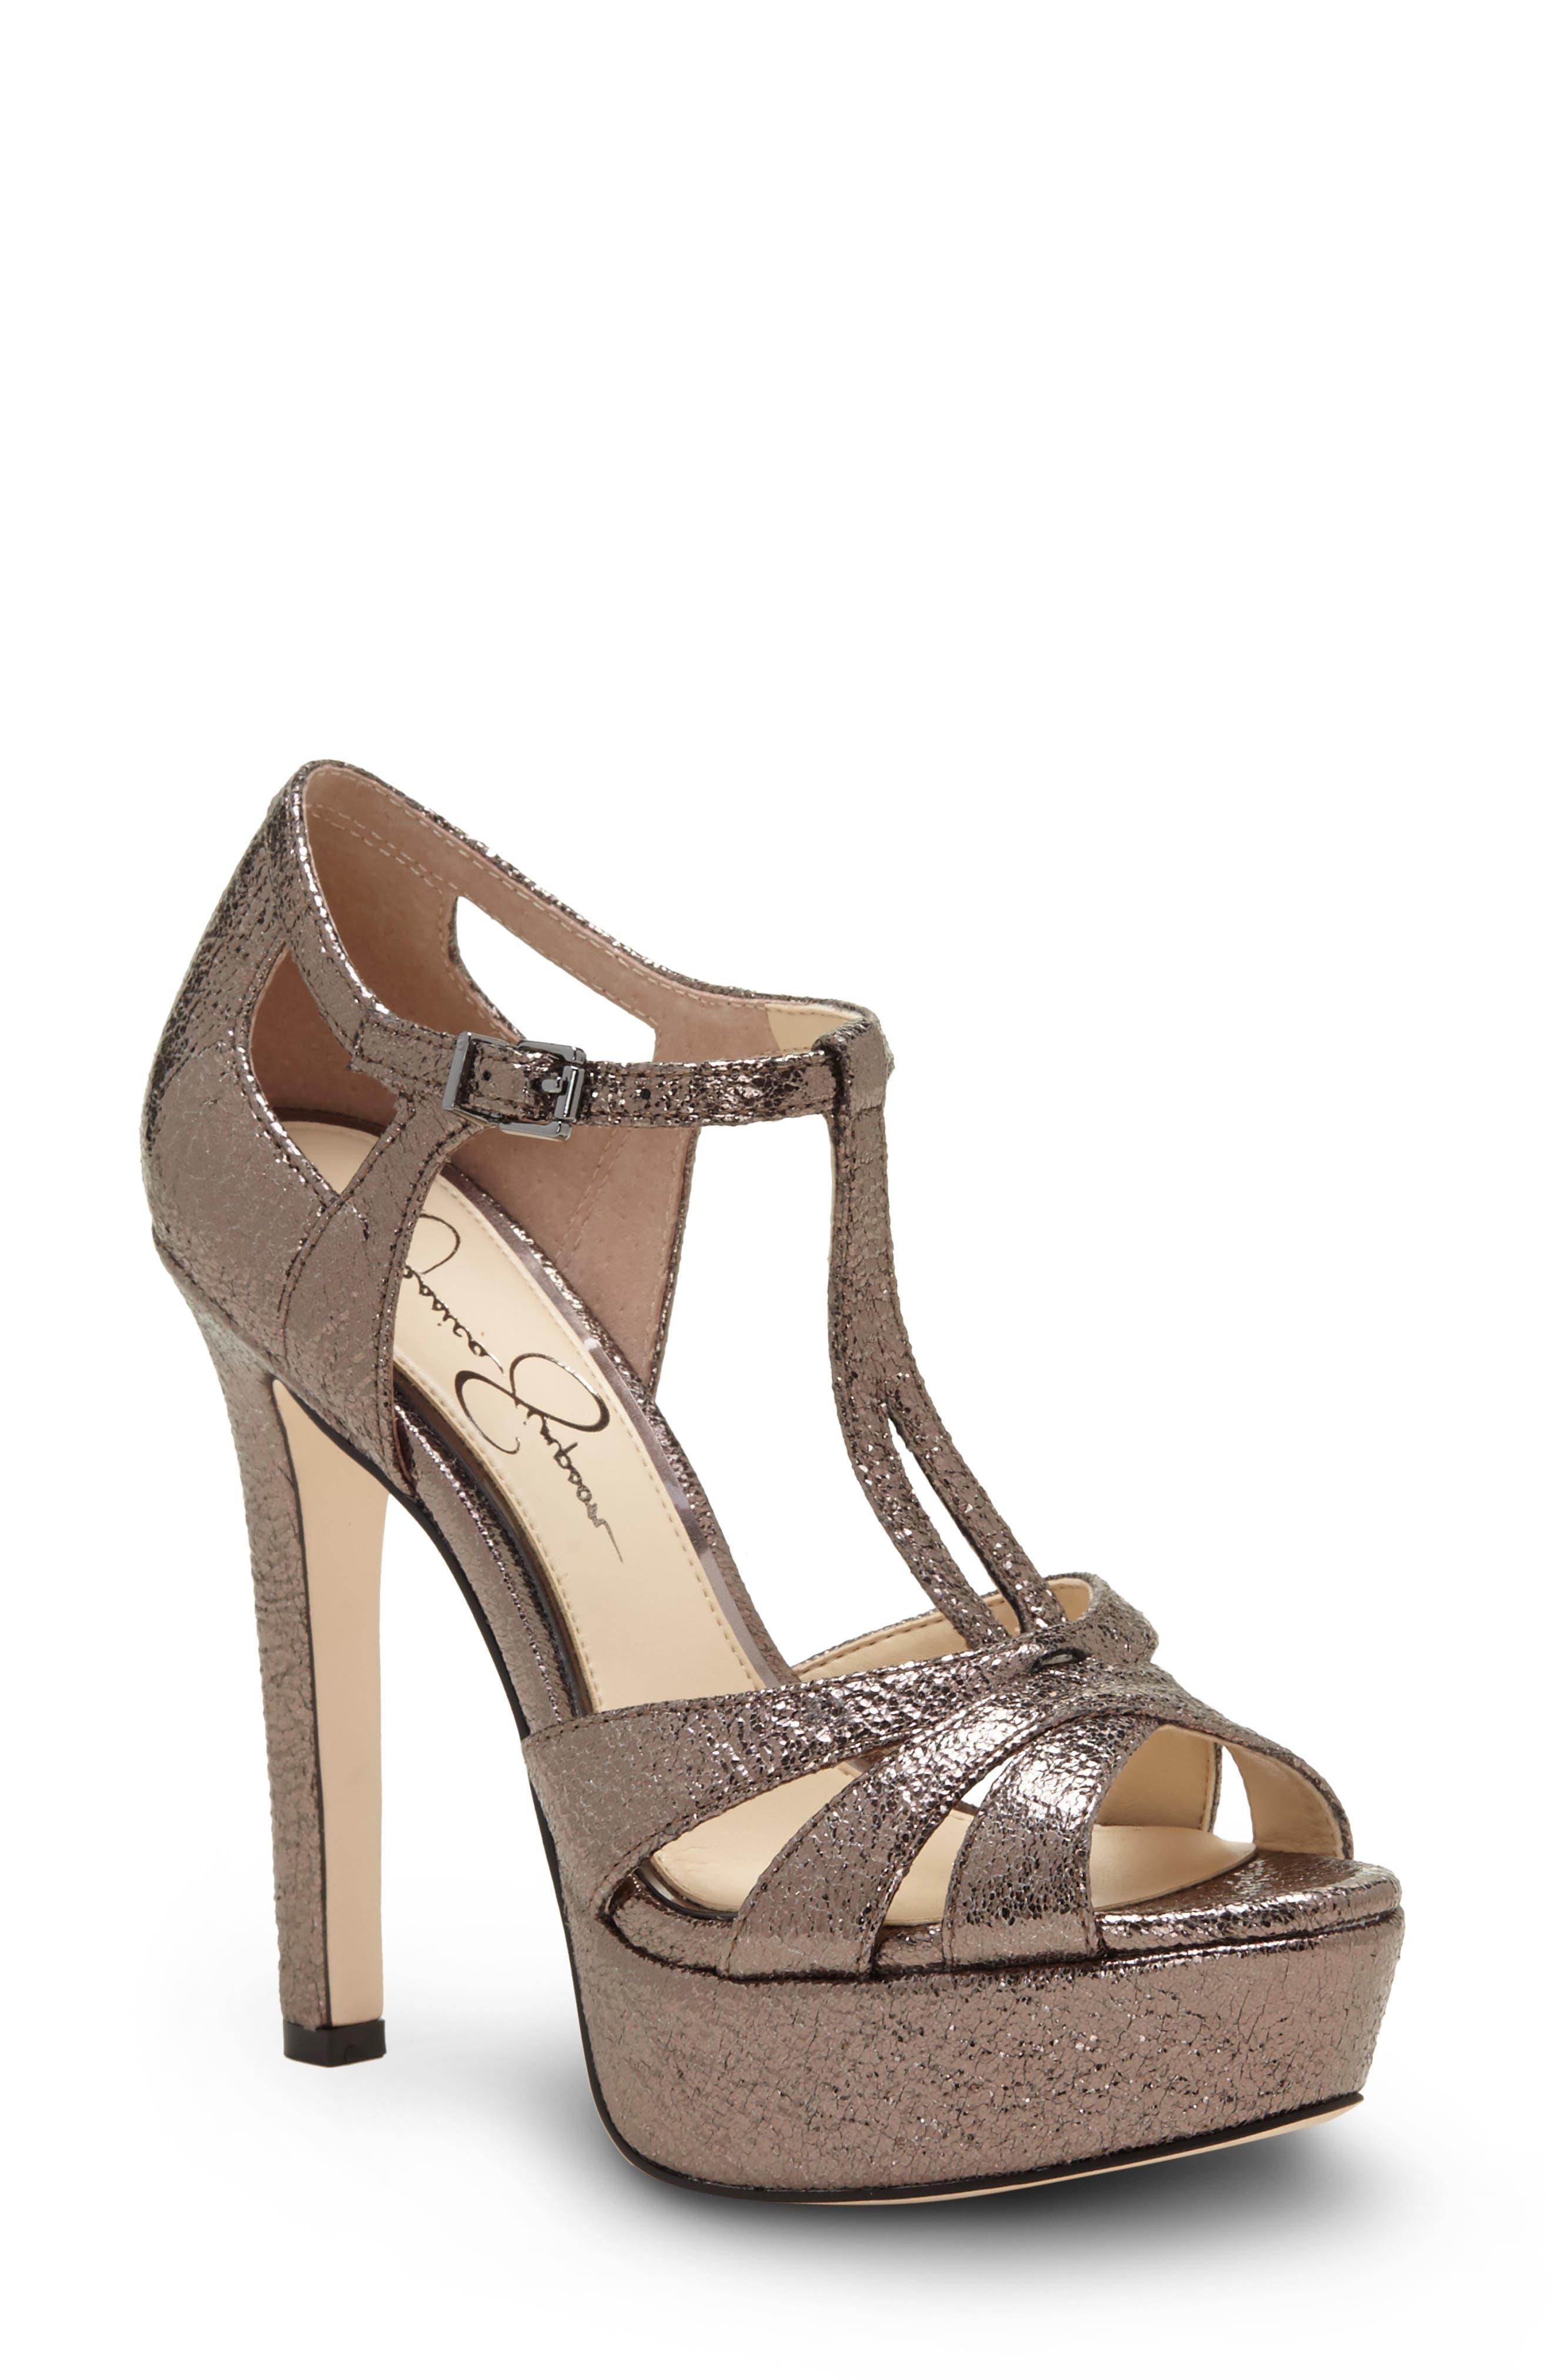 Jessica Simpson Bryanne Sandal, Grey